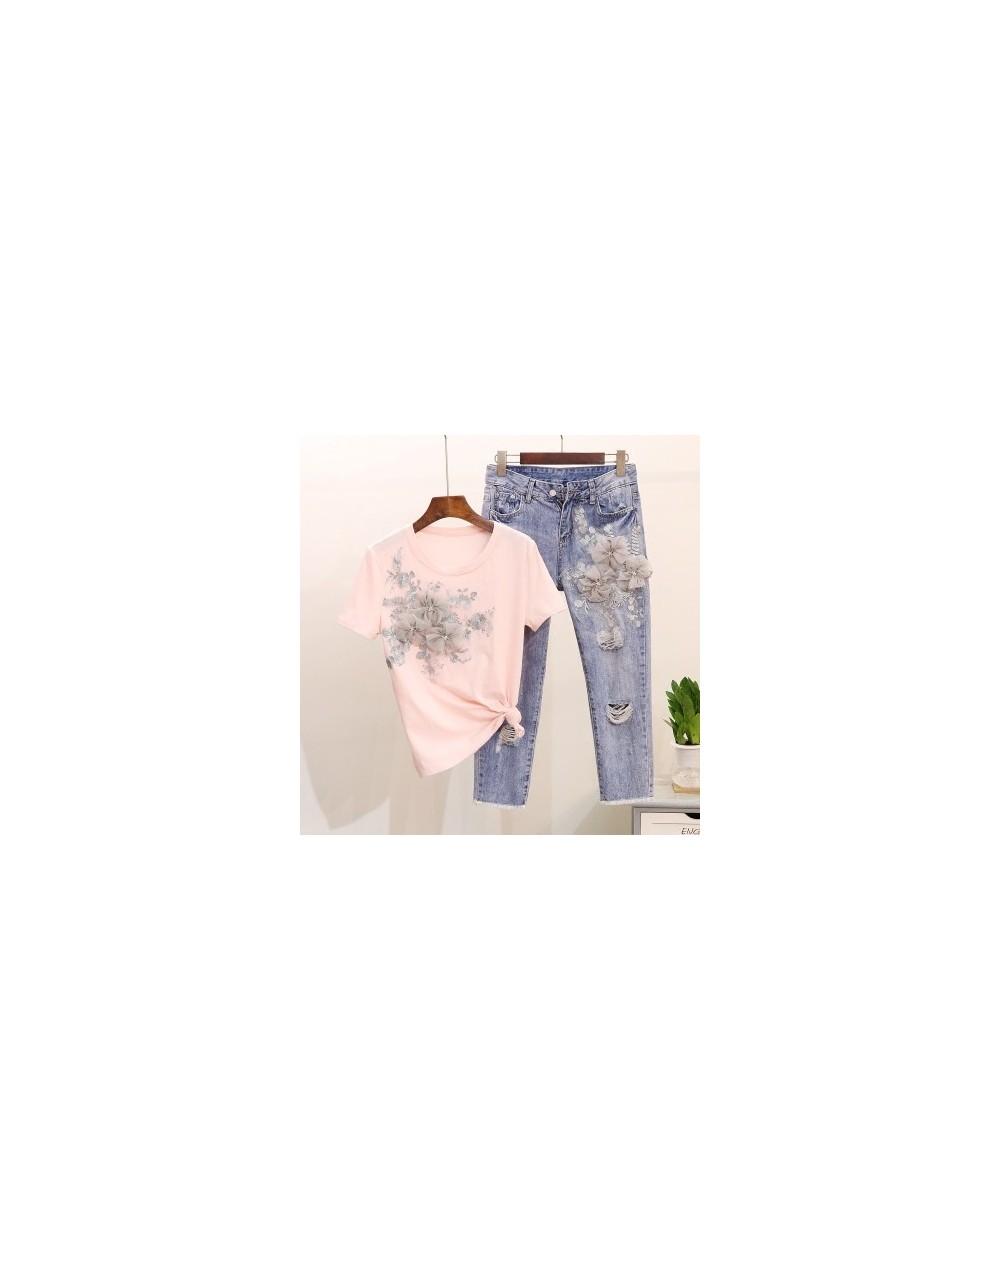 Women 3D Flower T-shirts Jeans Sets Appliques Embroidery Tshirts+Holes Jeans Pants Costumes Suits - Pink - 4P3975887102-2